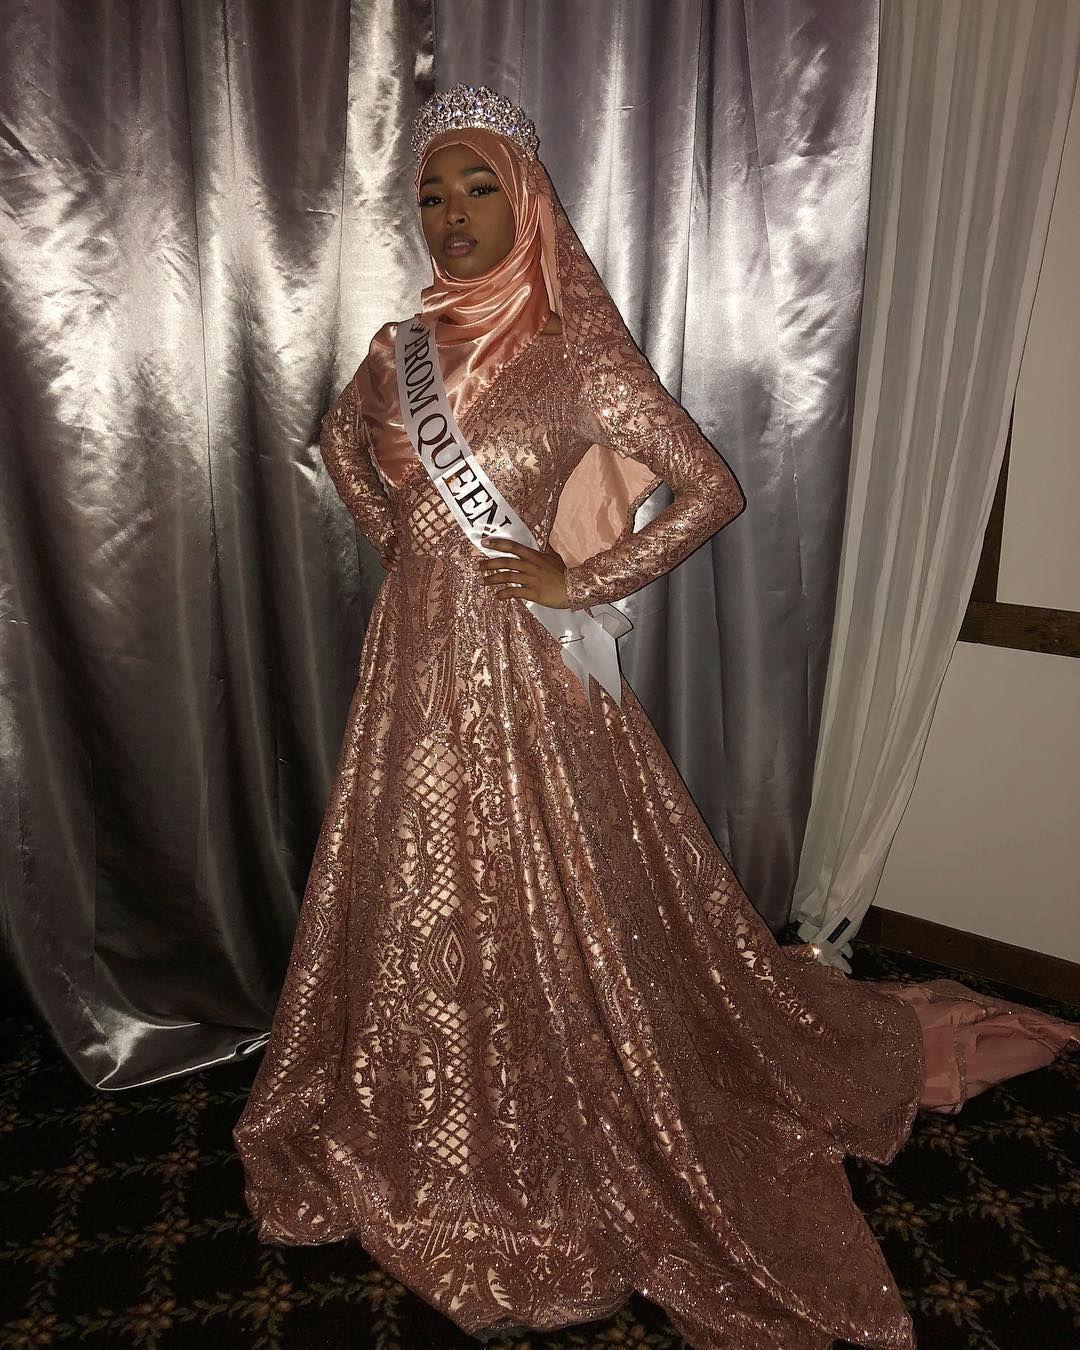 d0109b537cb PROM QUEEN Rafiqahs  rxfiqah Custom Prom Dress and Custom Hijab SLAYED BY  ZAVI